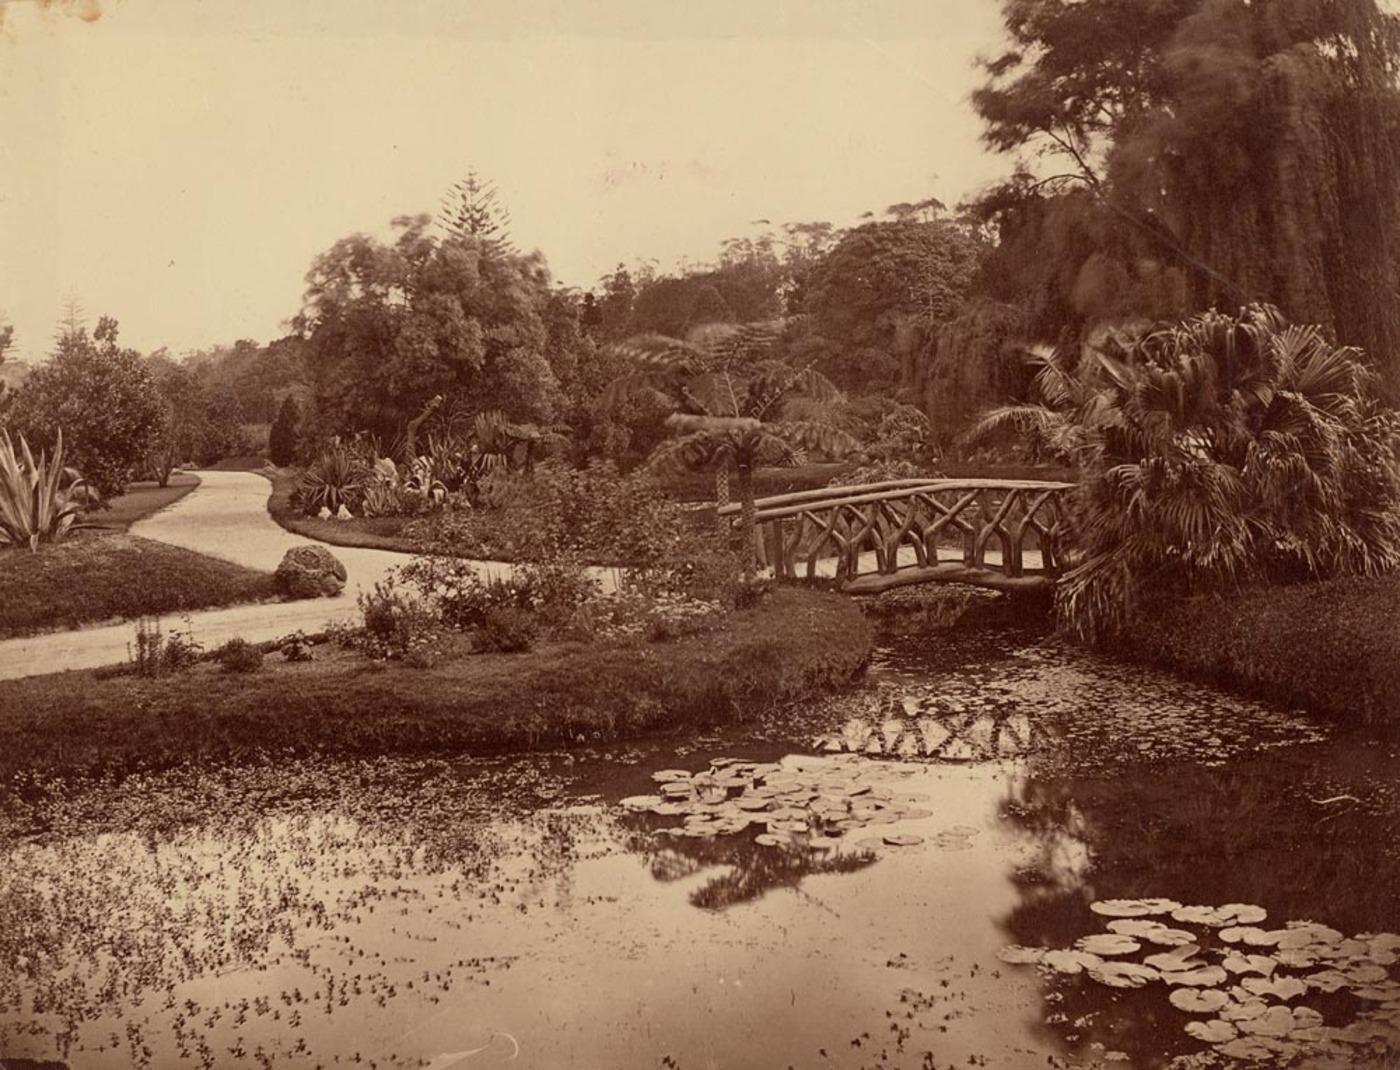 [Pond and bridge, Botanic Gardens, Sydney / attributed to the photographer William Vosper]